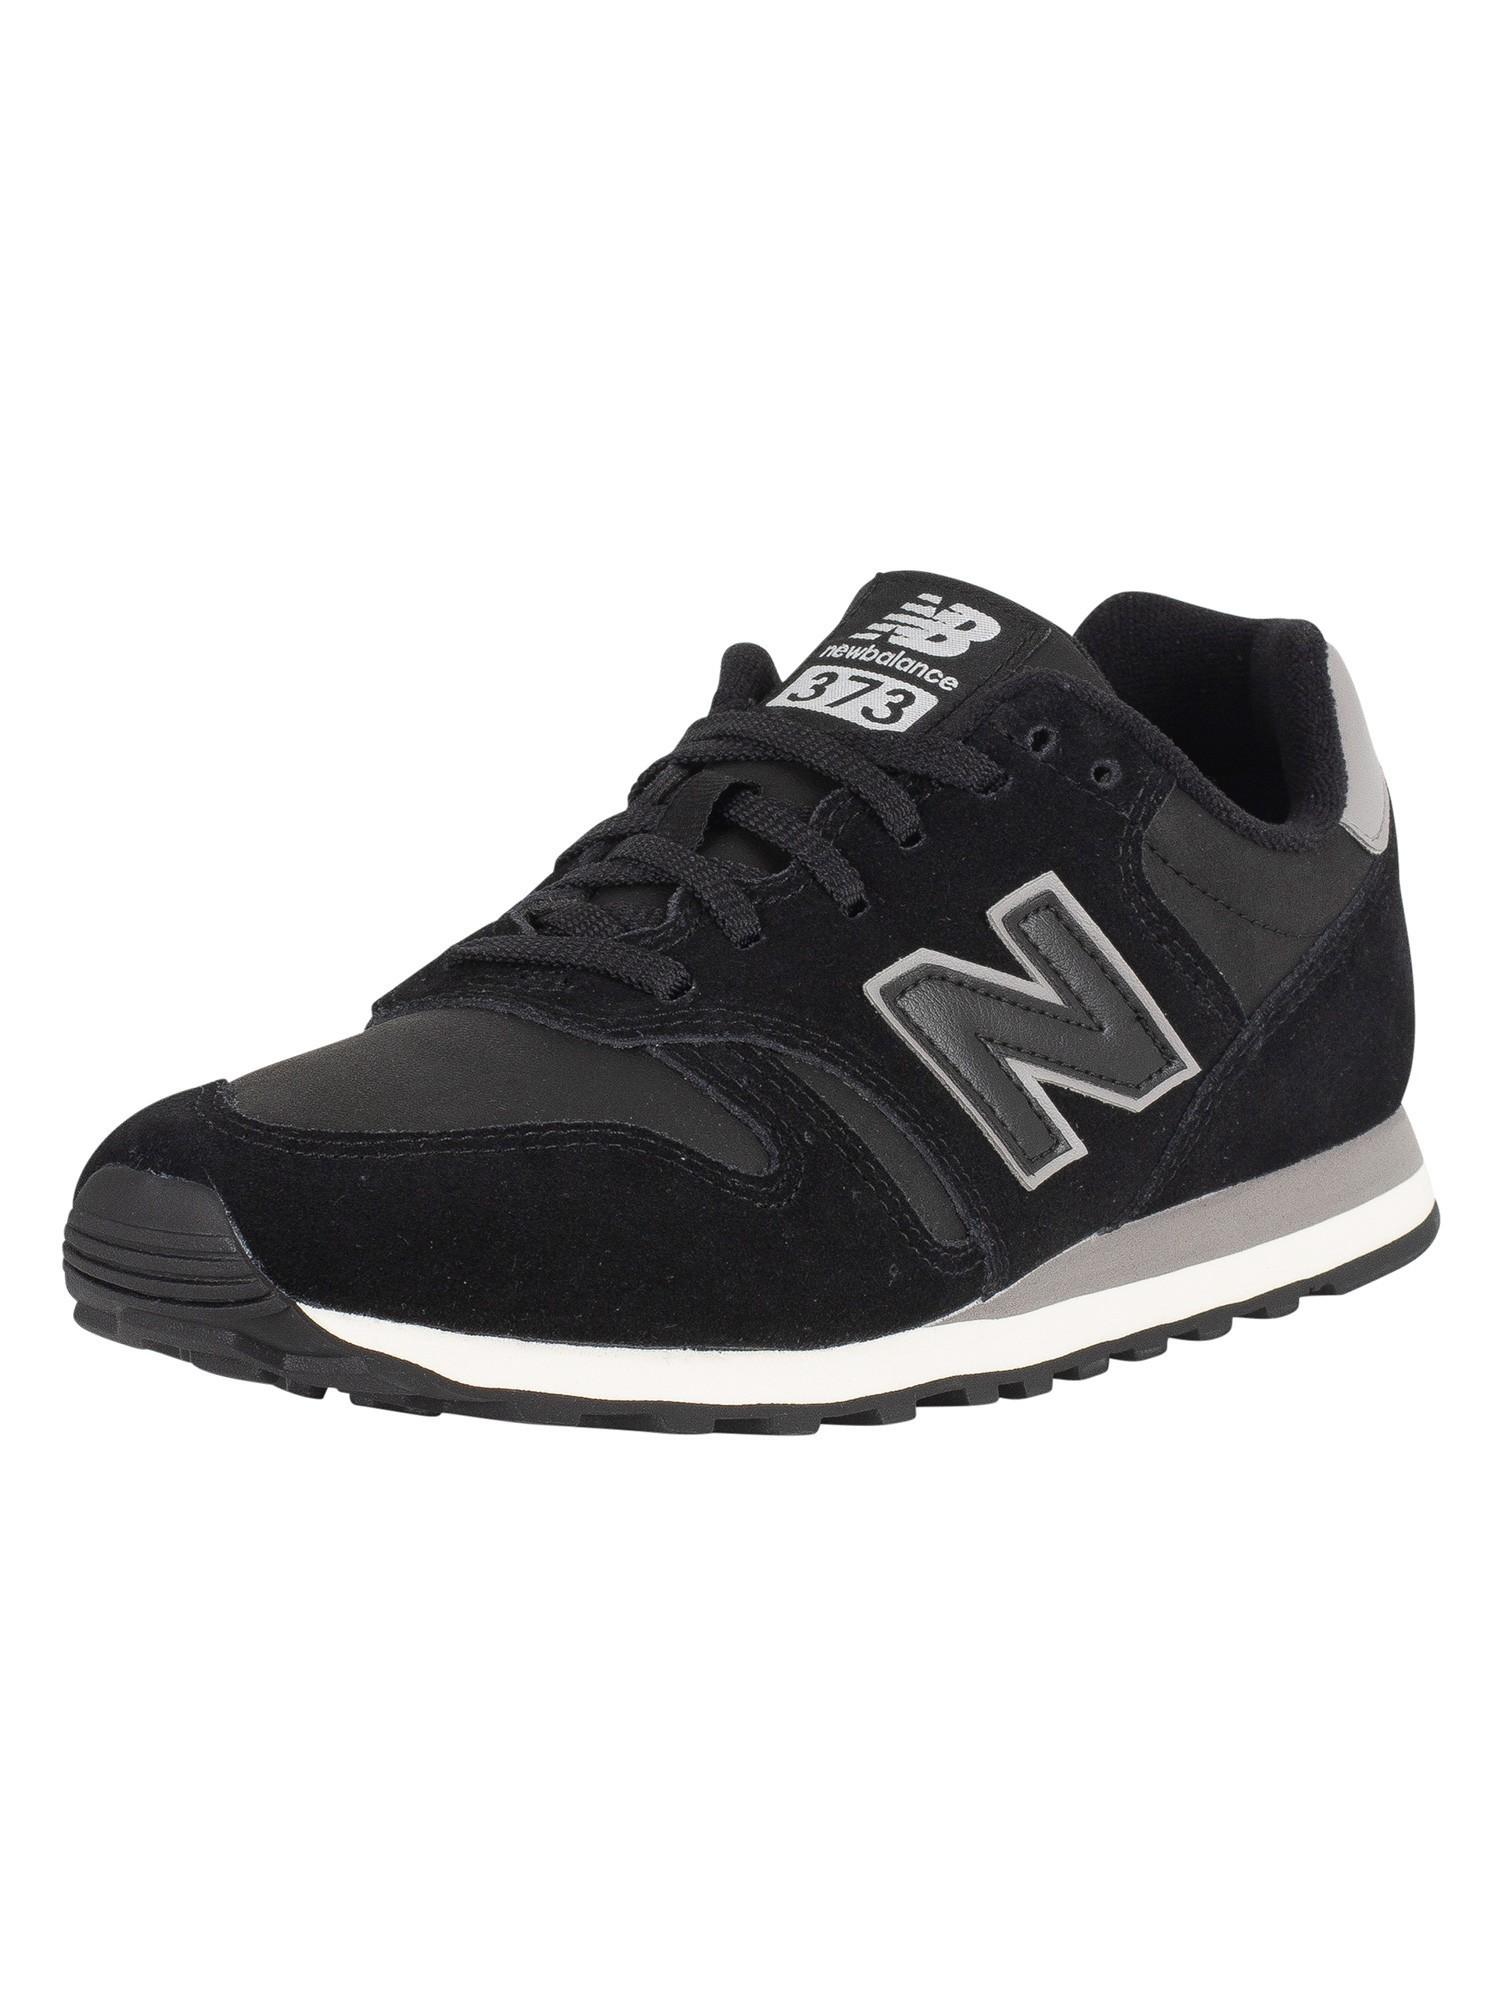 san francisco c10fe 98683 New Balance 373 Suede Trainers - Black/Grey